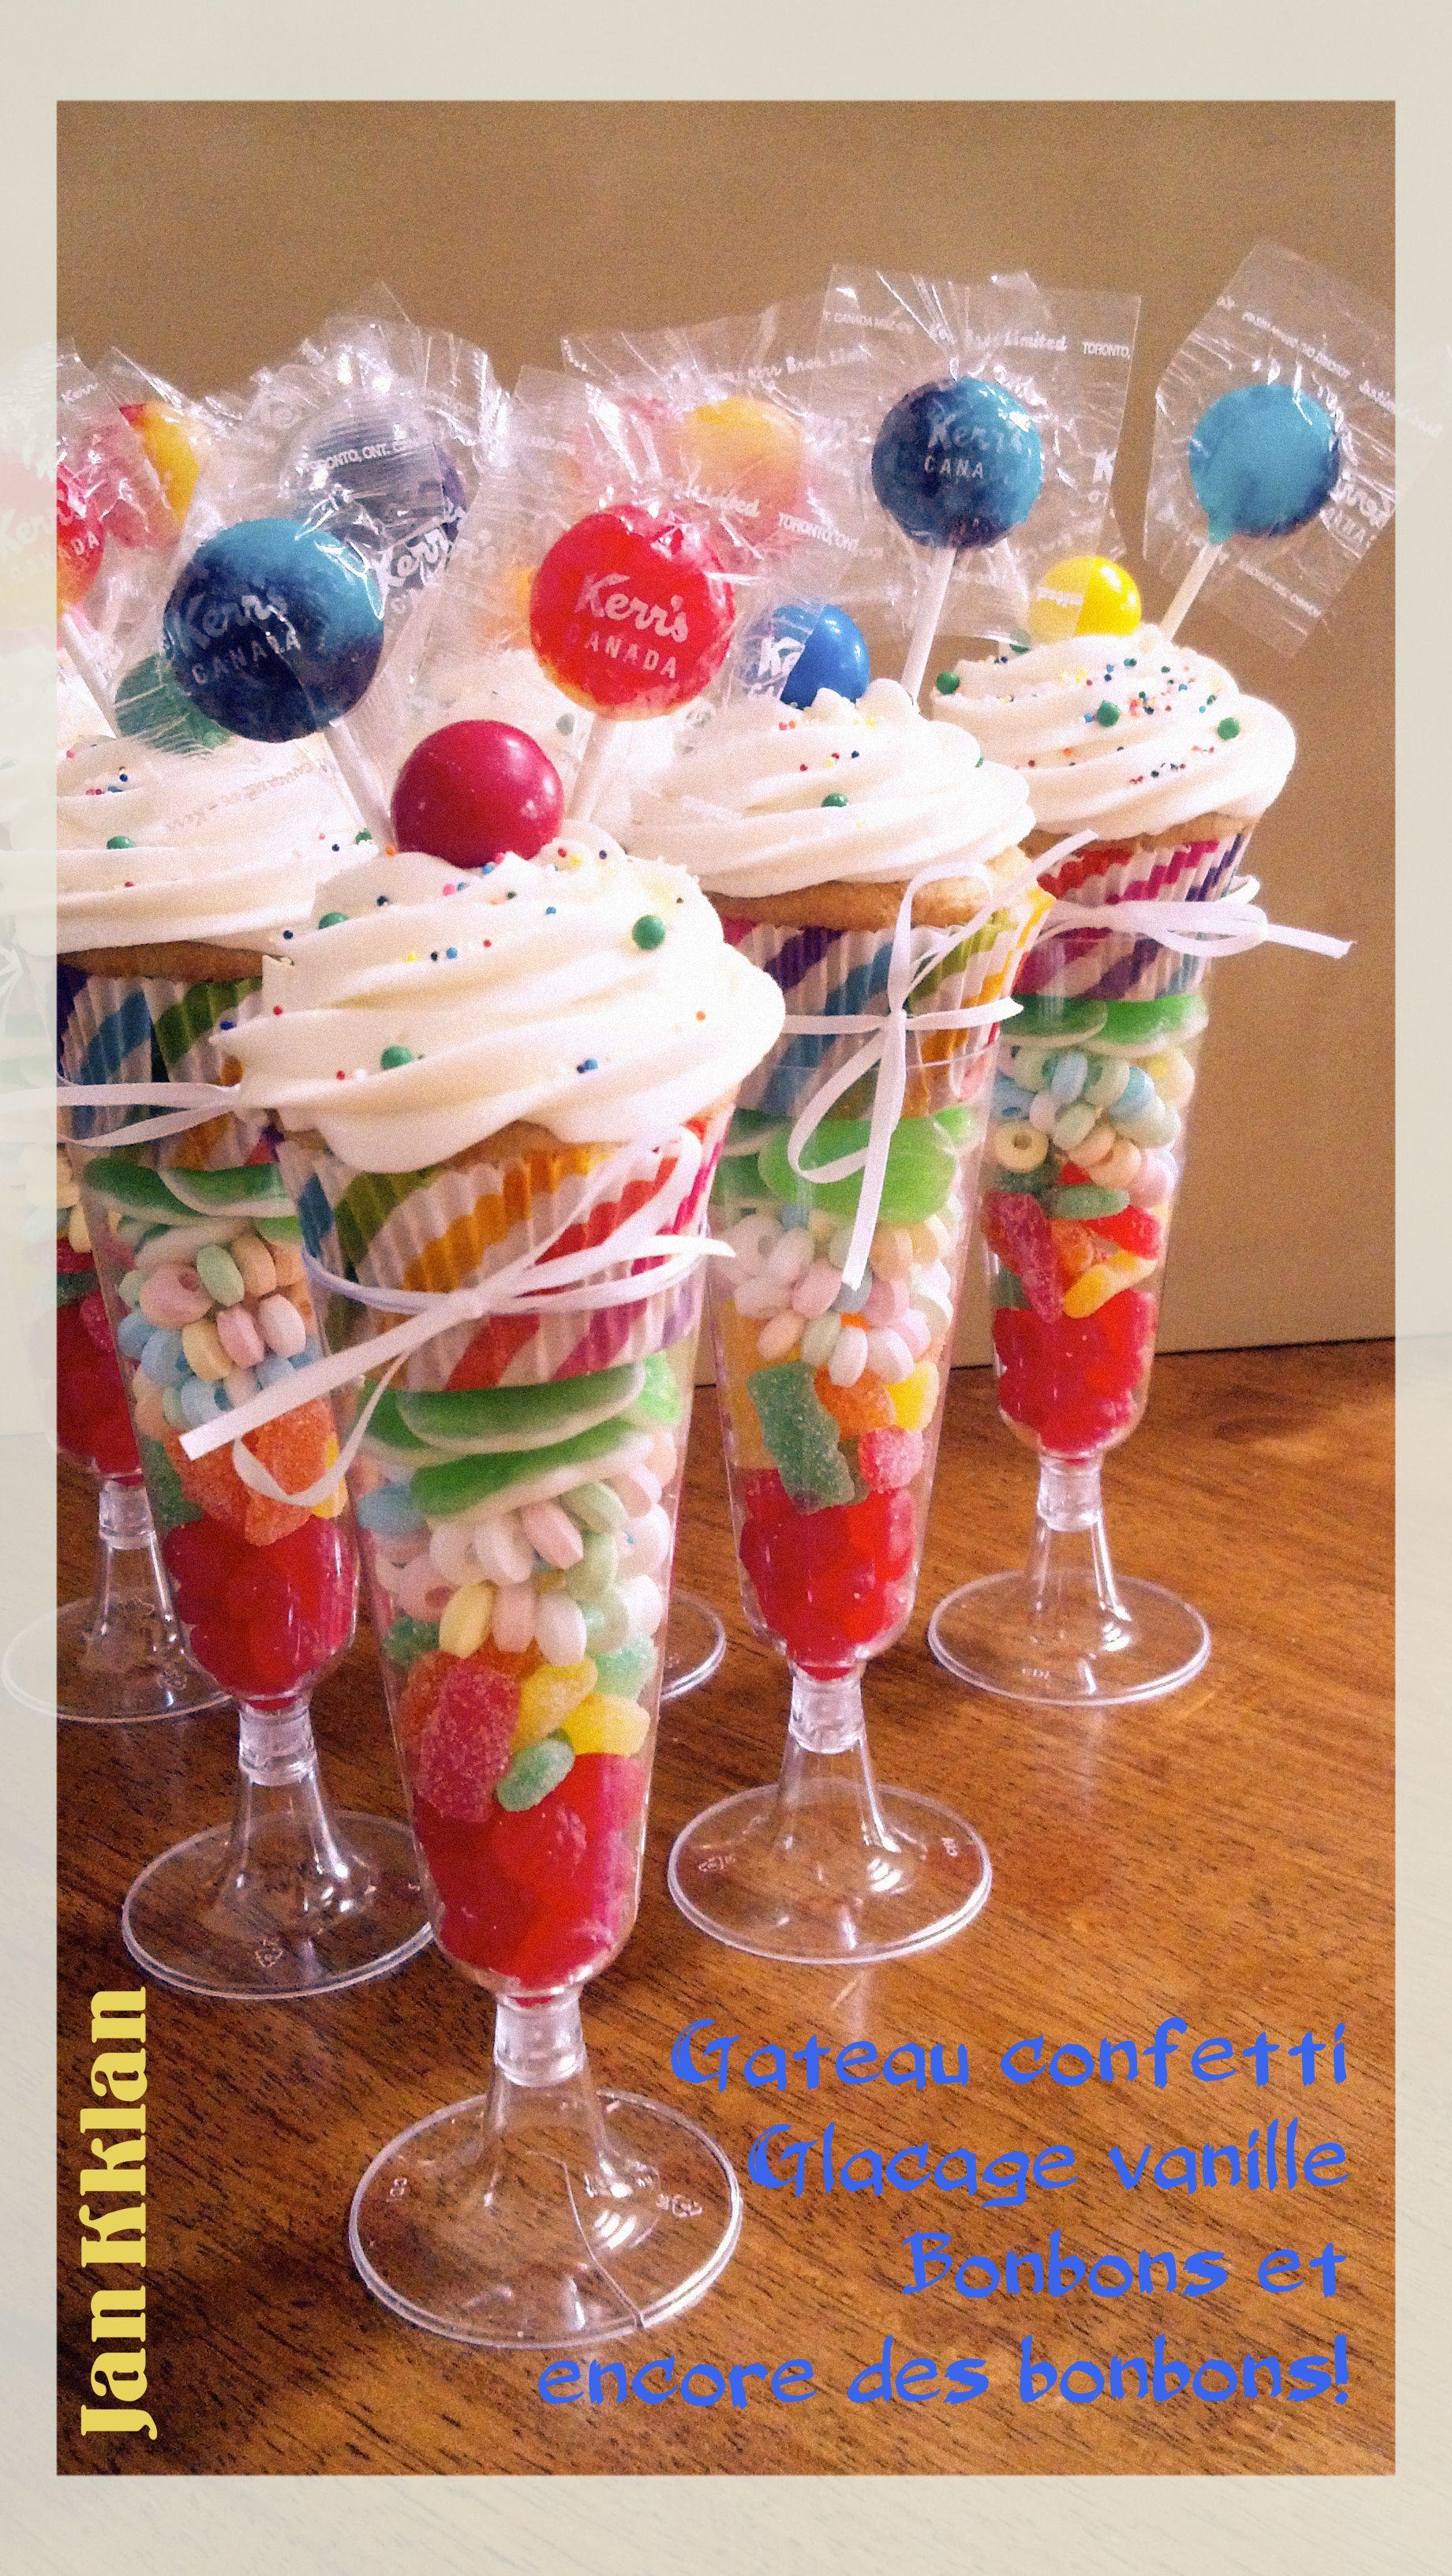 Souvenir copa con golosinas y cupcake cumplea os - Golosinas para cumpleanos de ninos ...